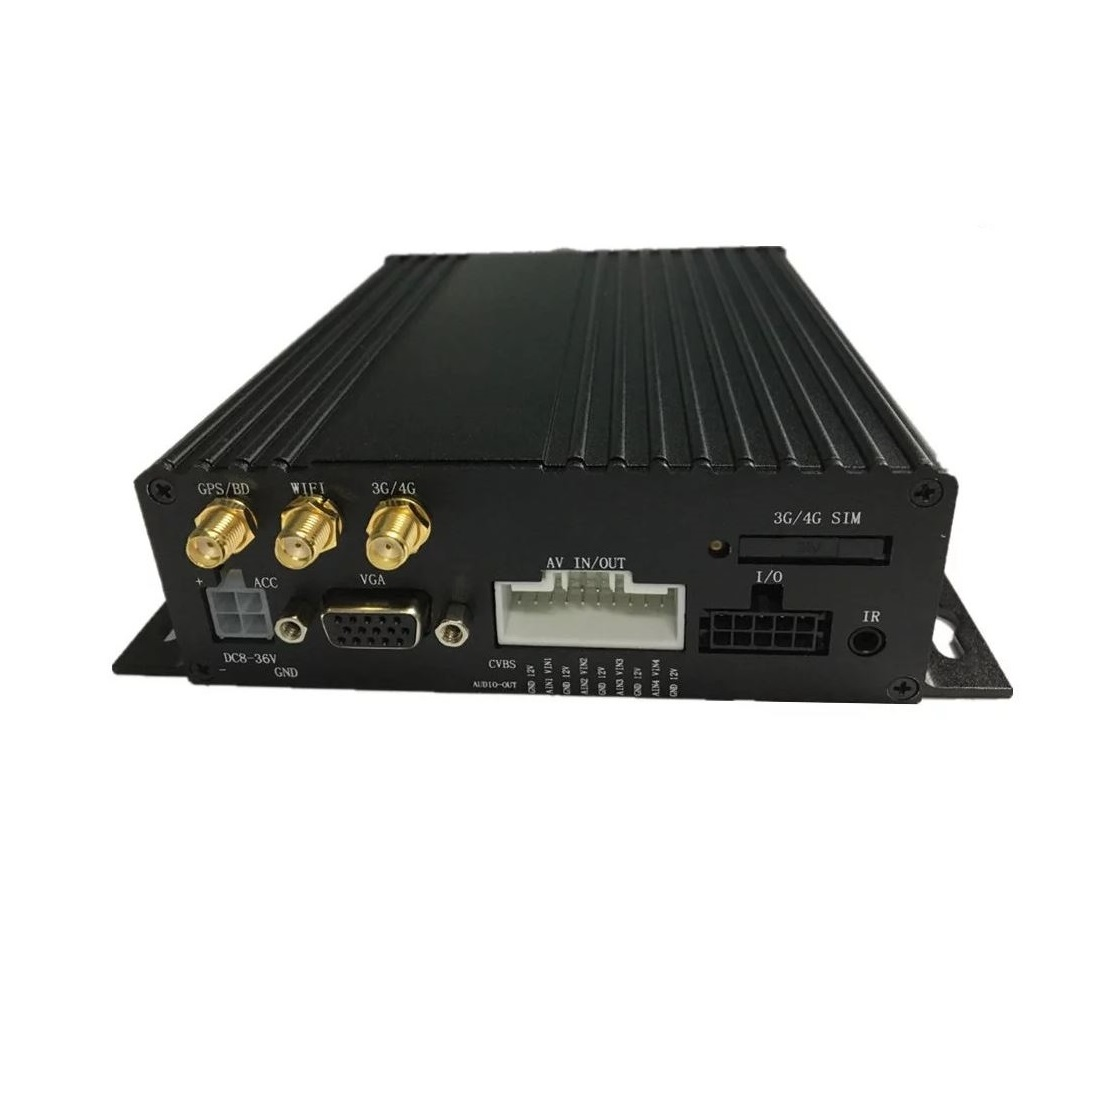 М2Медиа-1080p SD (4 канала, опционально ГЛОНАСС/GPS, 4G, WiFi))